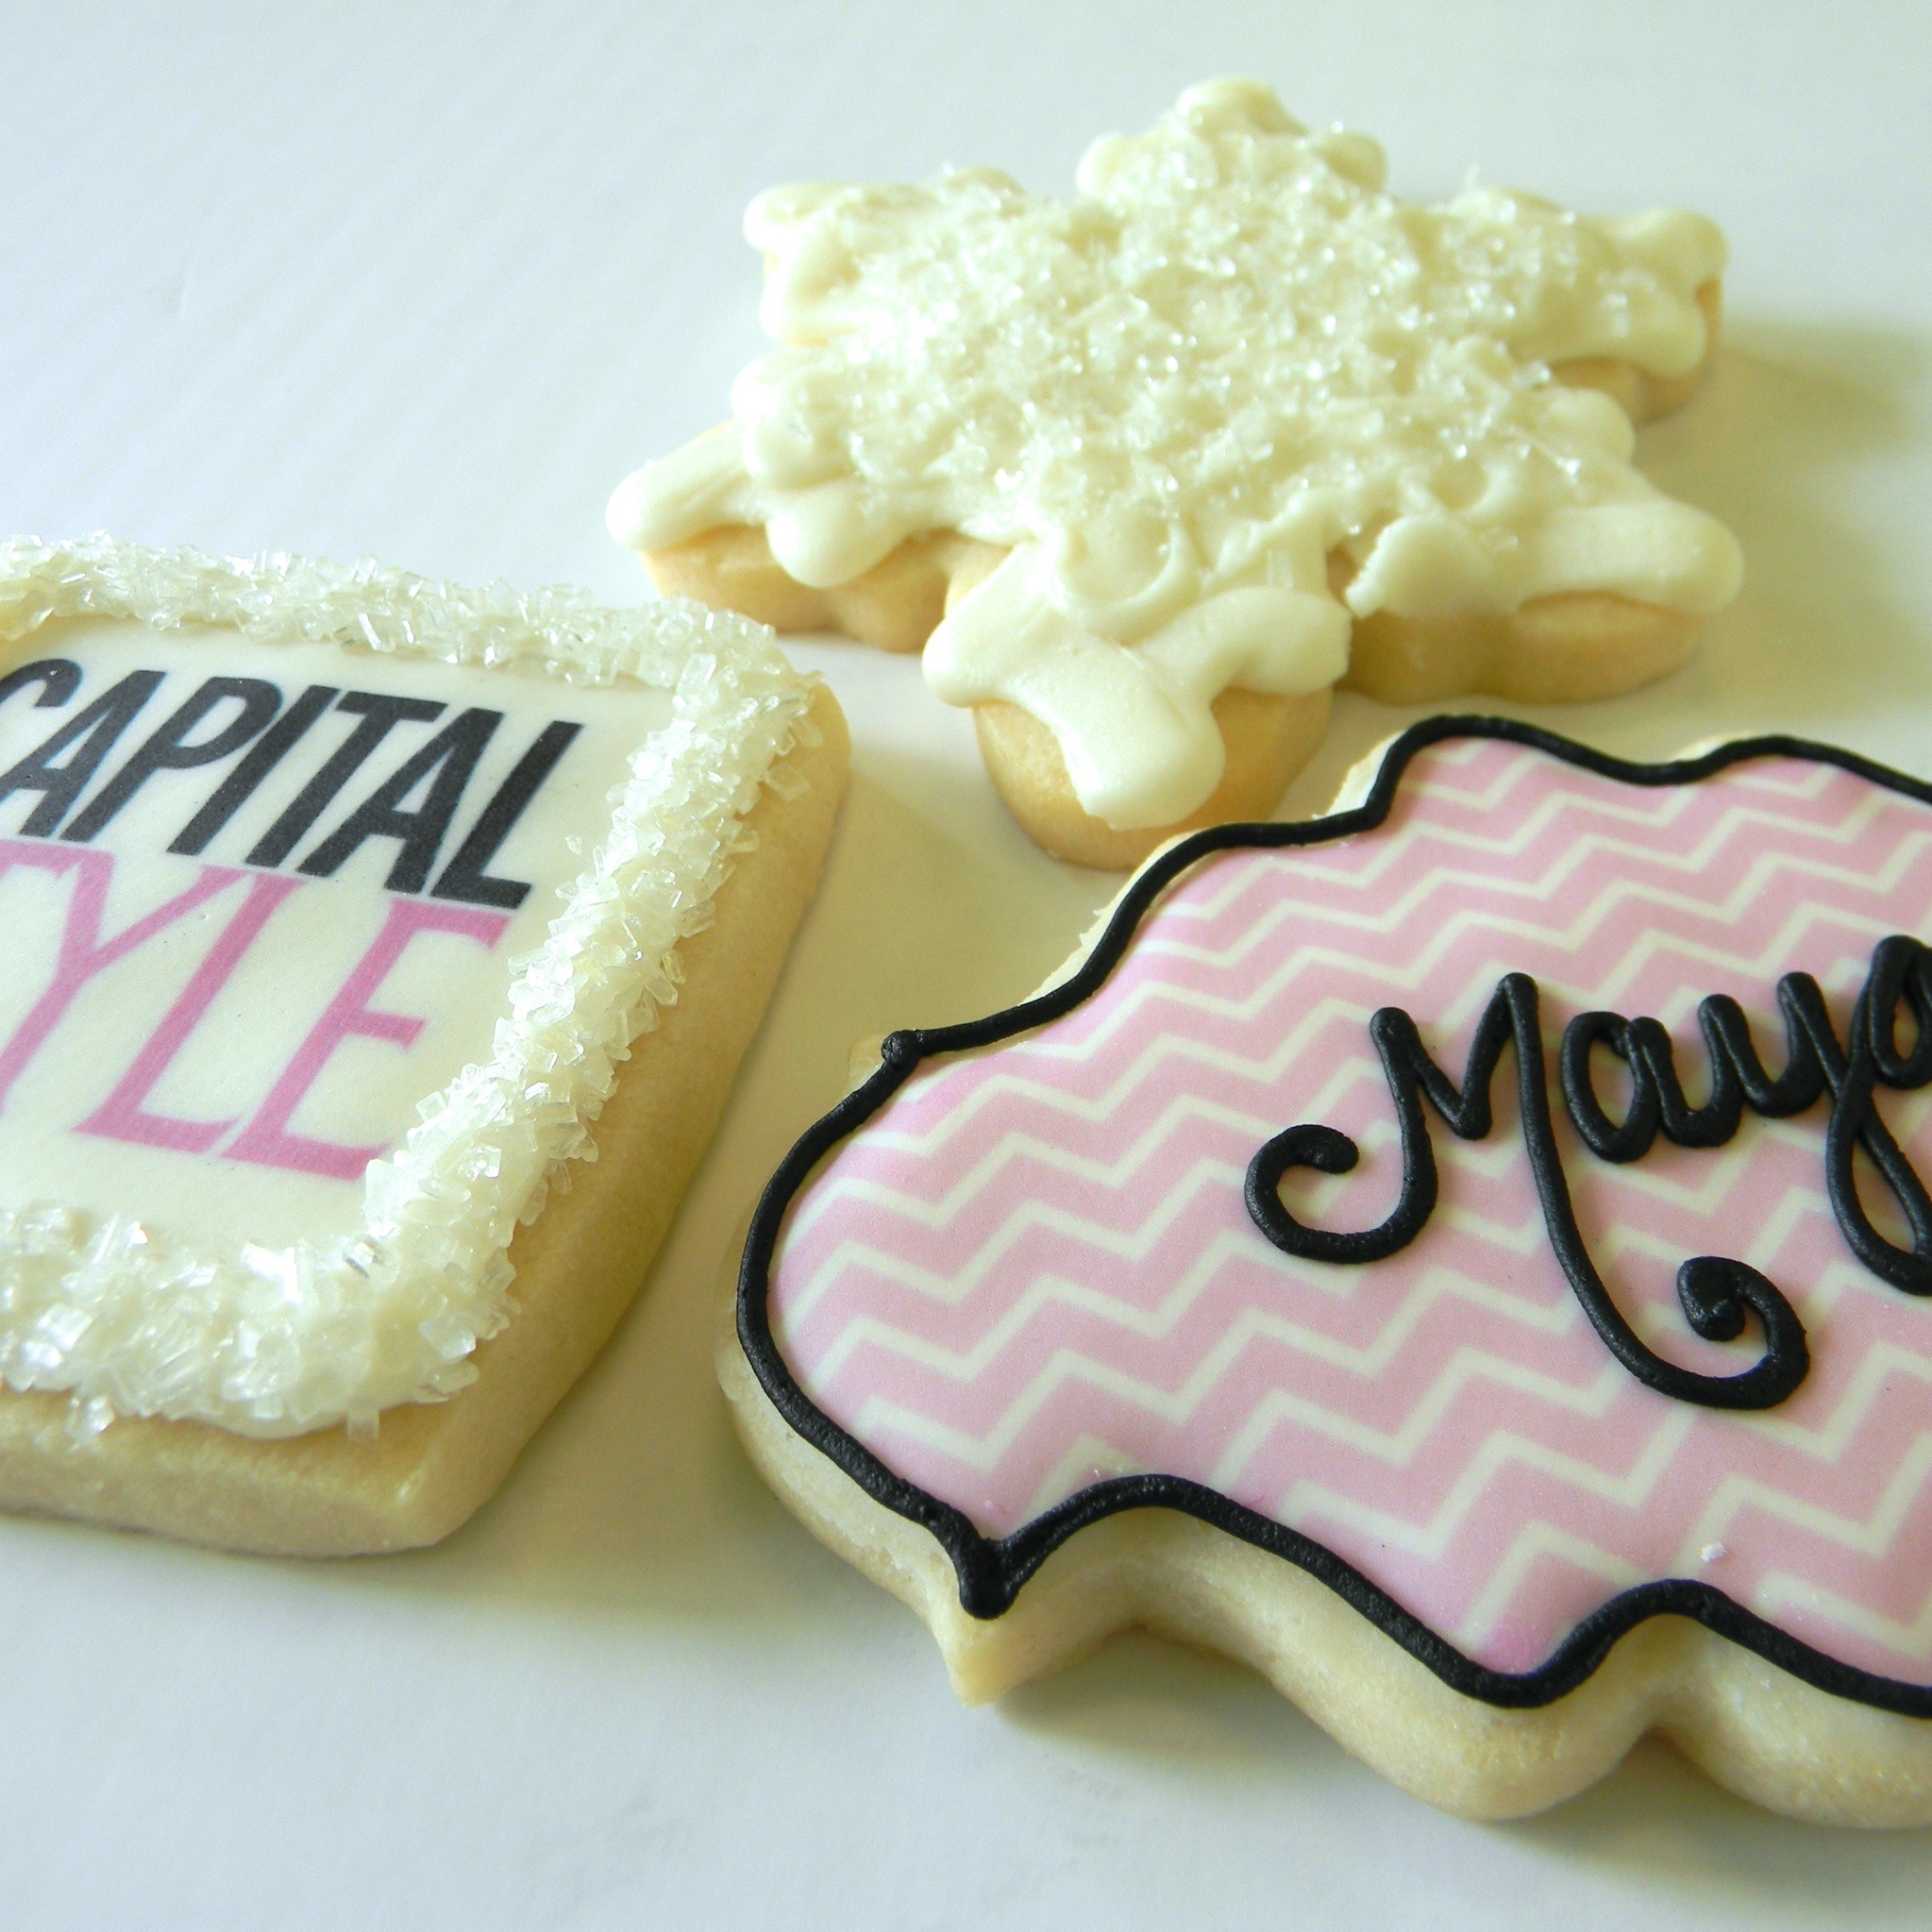 Capital.Style.Cookie.jpg